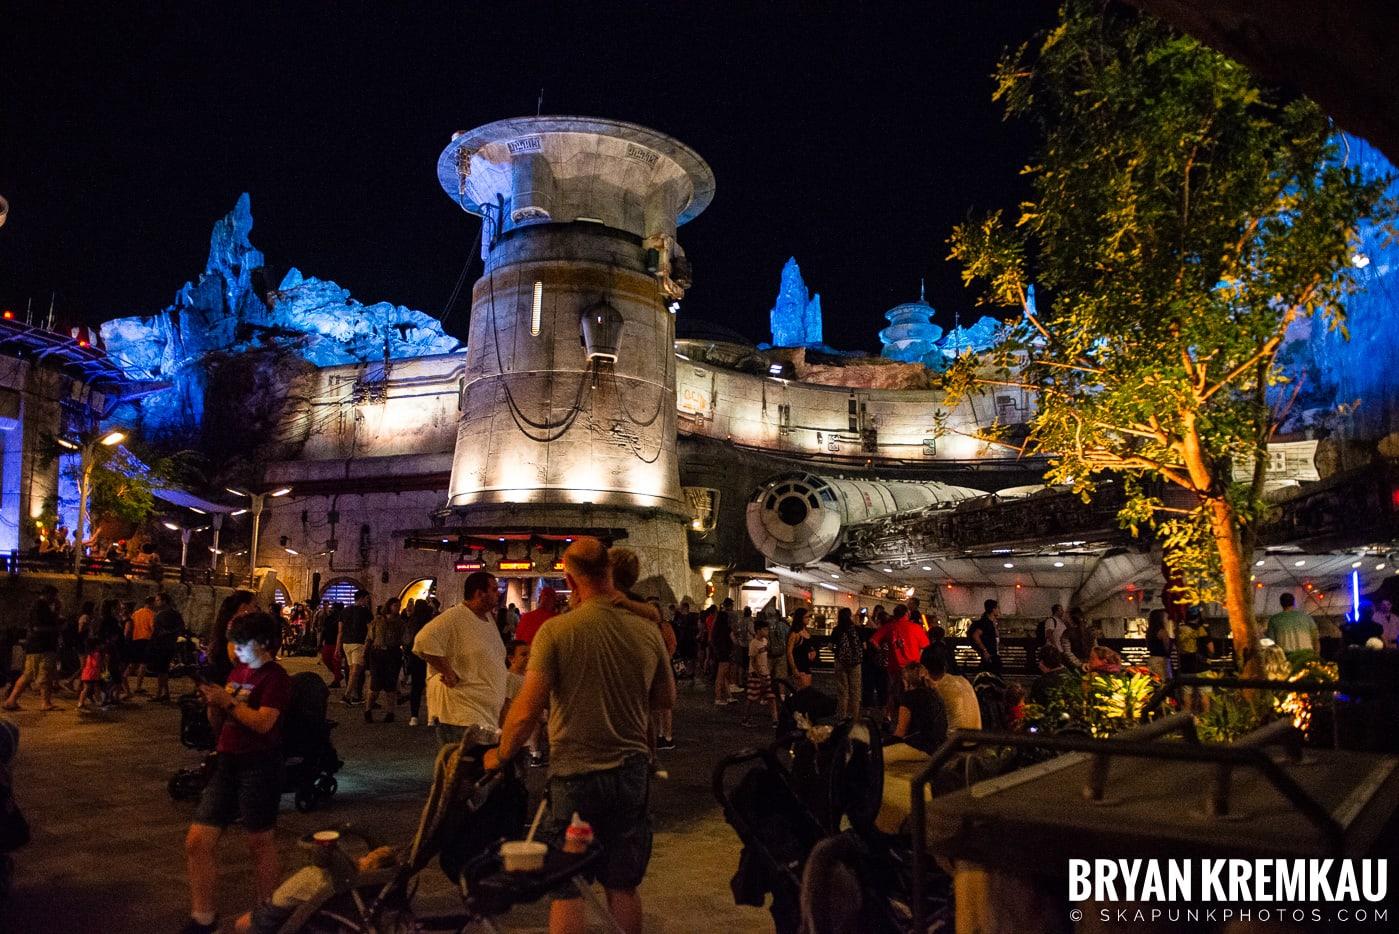 Walt Disney World Vacation: Day 6 (Magic Kingdom, Epcot, Disney's Hollywood Studios) - 10.4.19 (10)